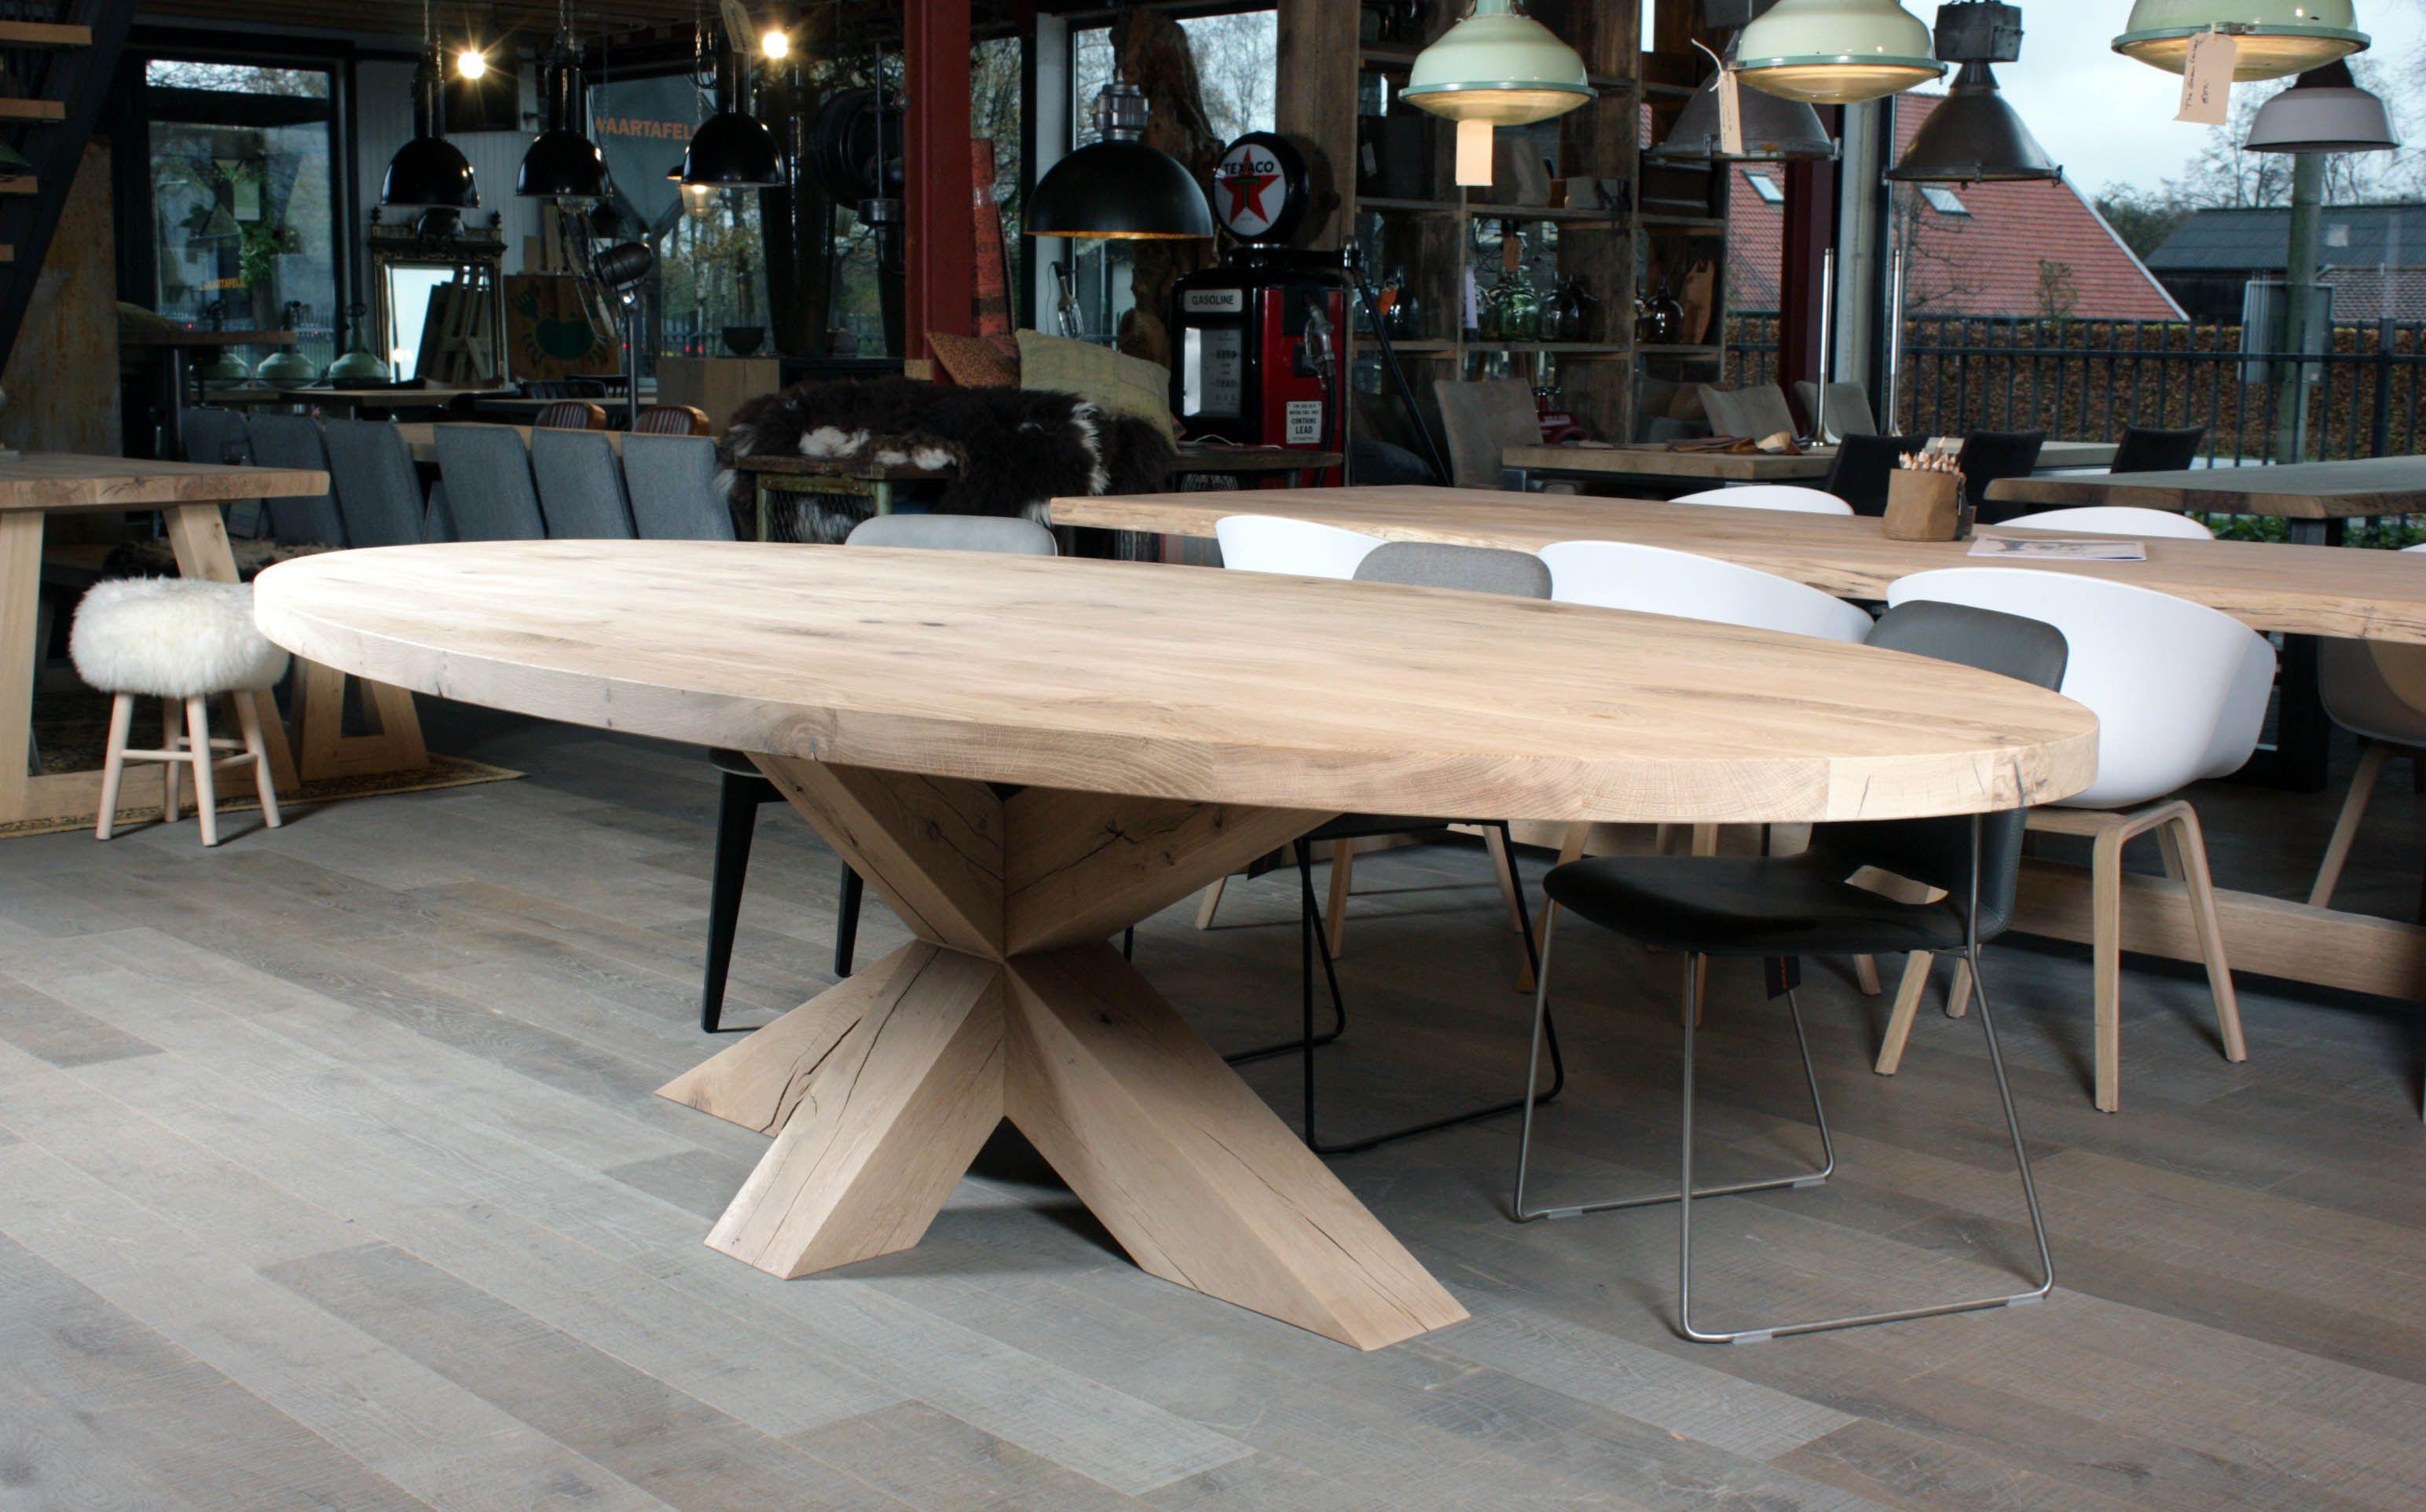 Vaak ZWAARTAFELEN I Mooie ovale tafel www.zwaartafelen.nl | eetkamer in @QE13